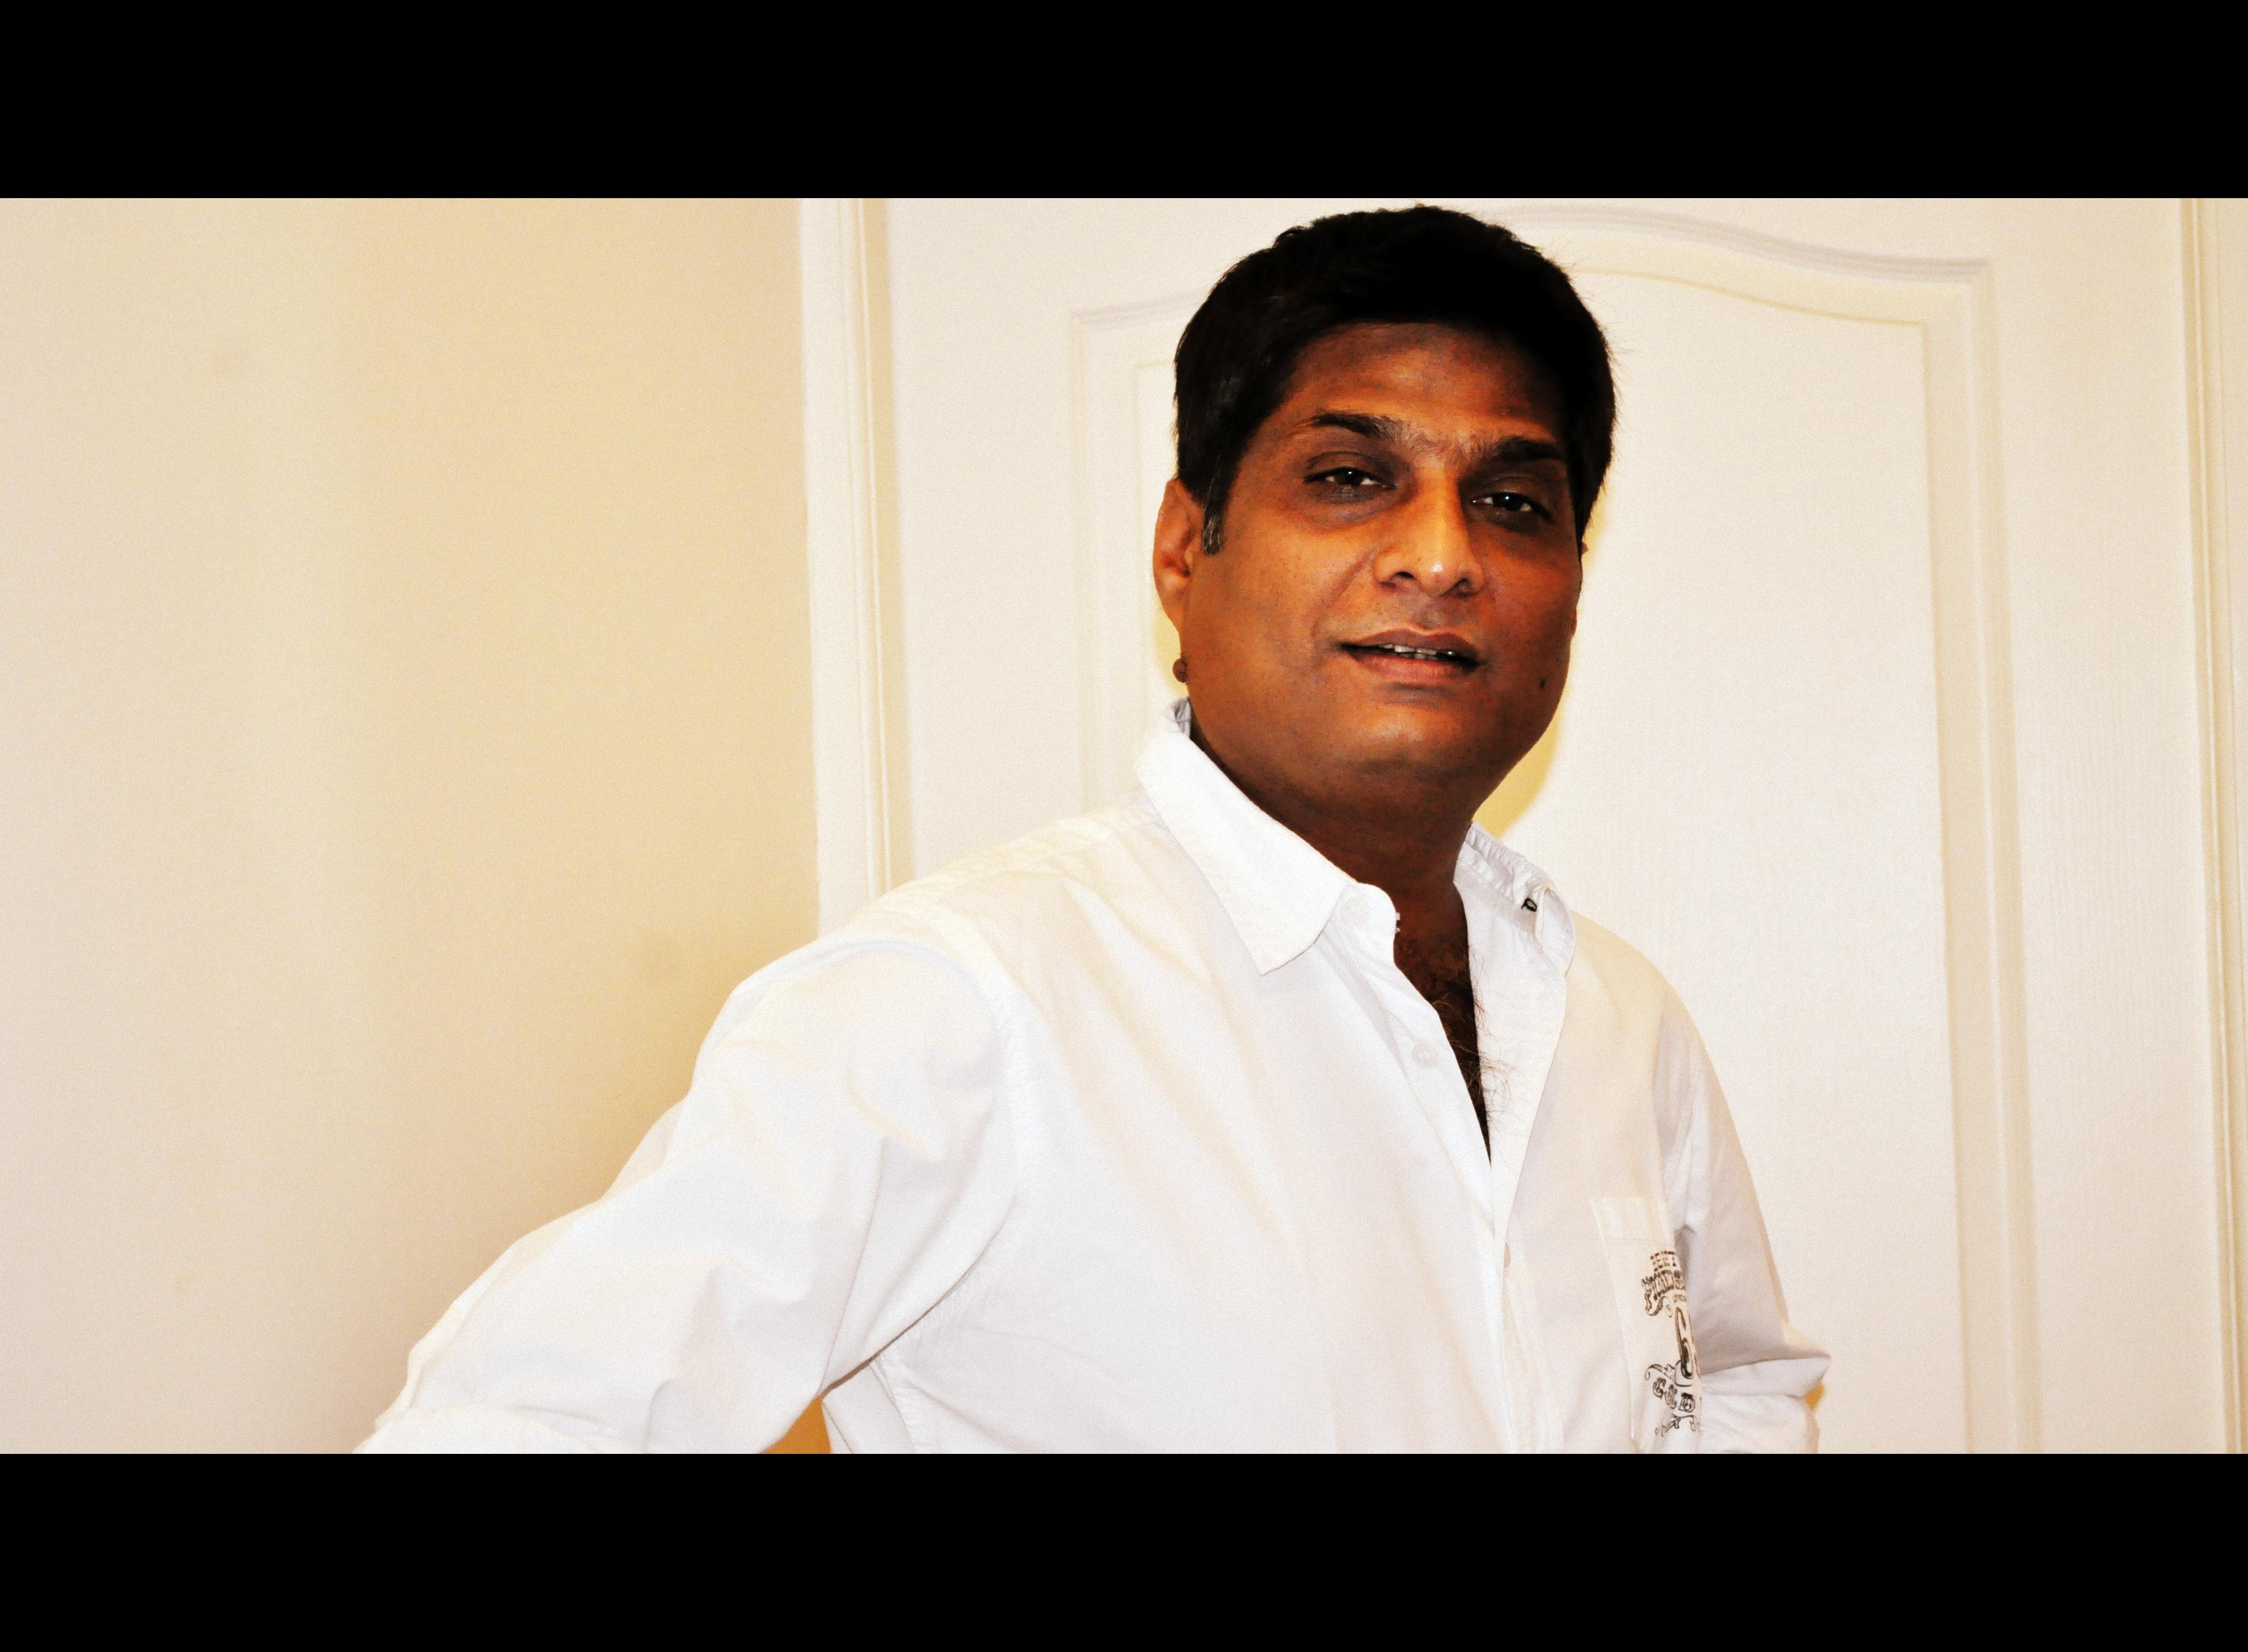 Subhash Saraff